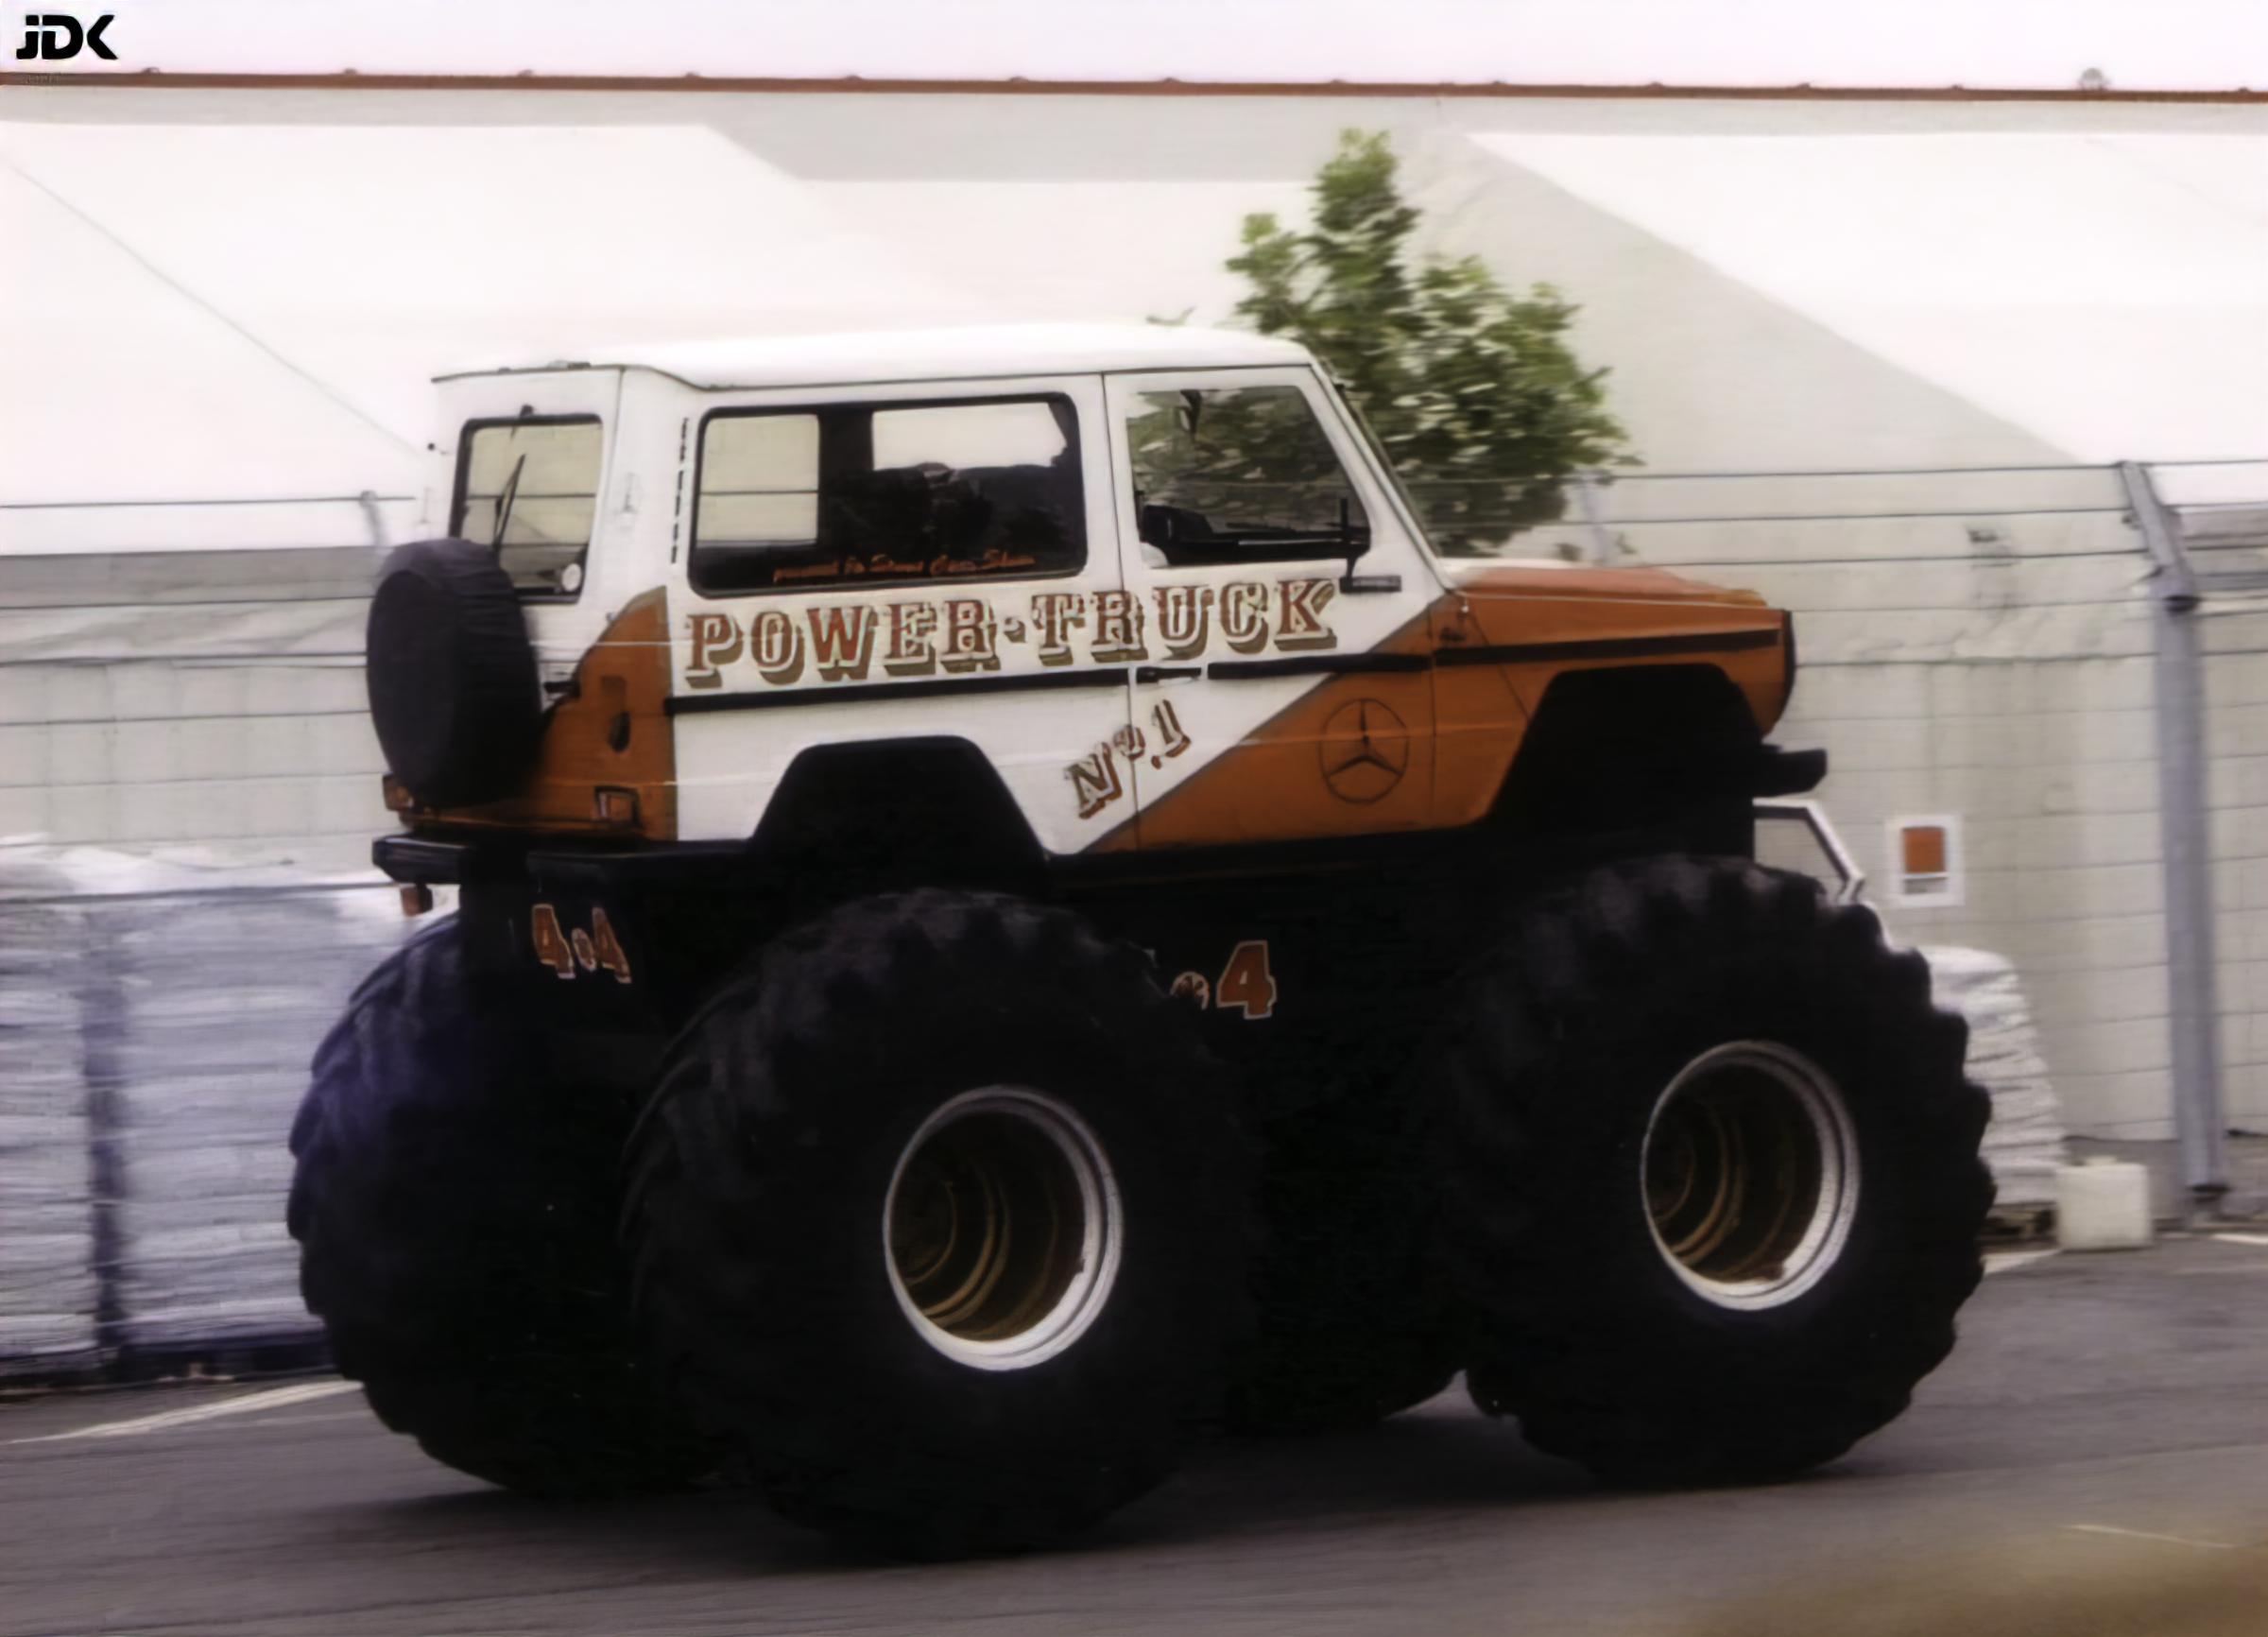 File:Power-truck4x4.jpg